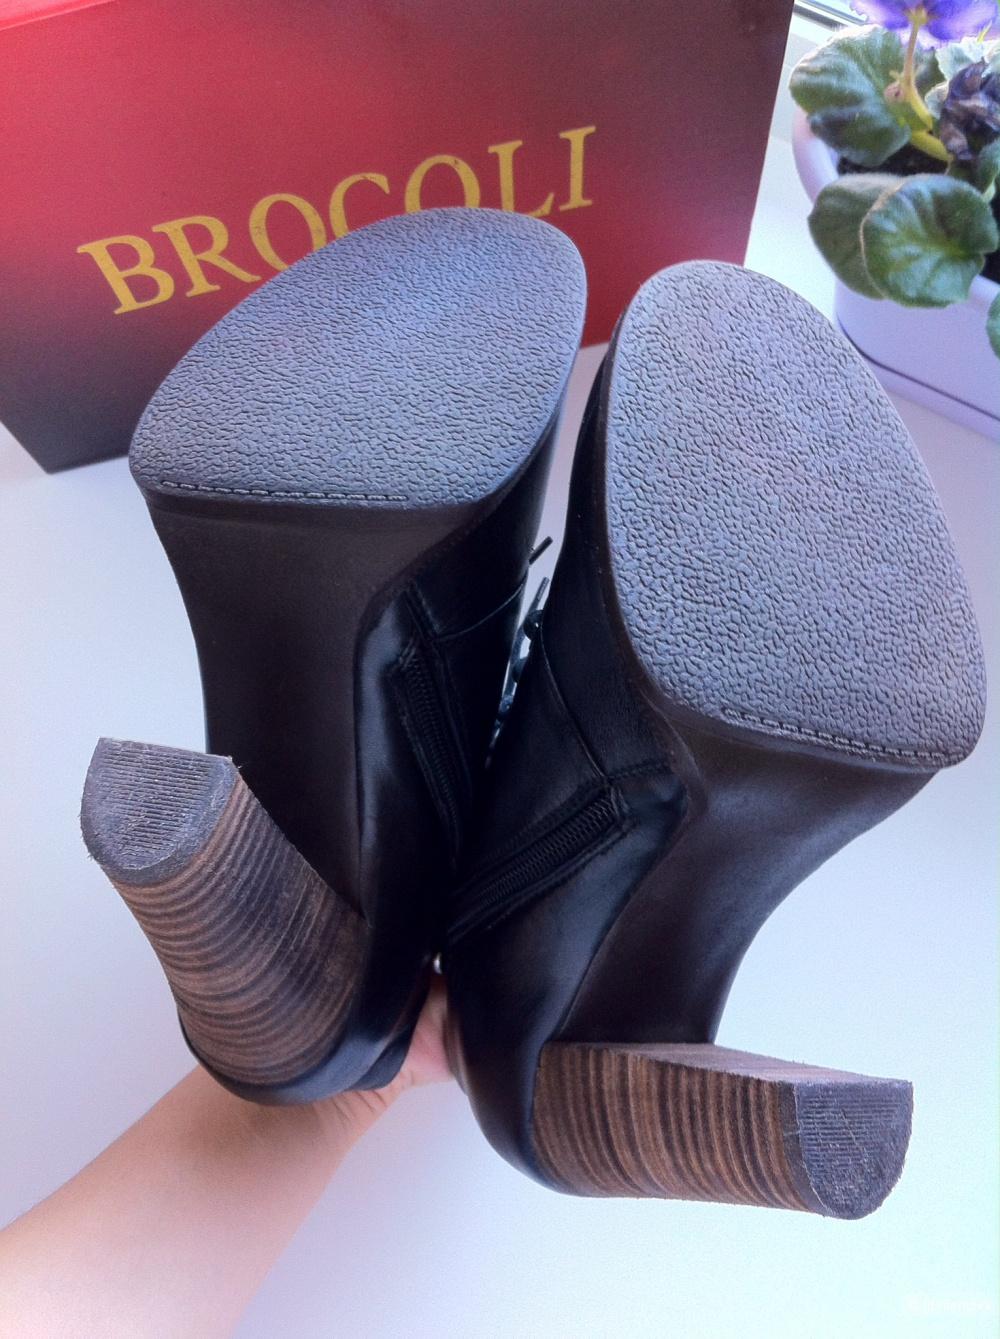 Ботильоны Brocoli, 37 размер